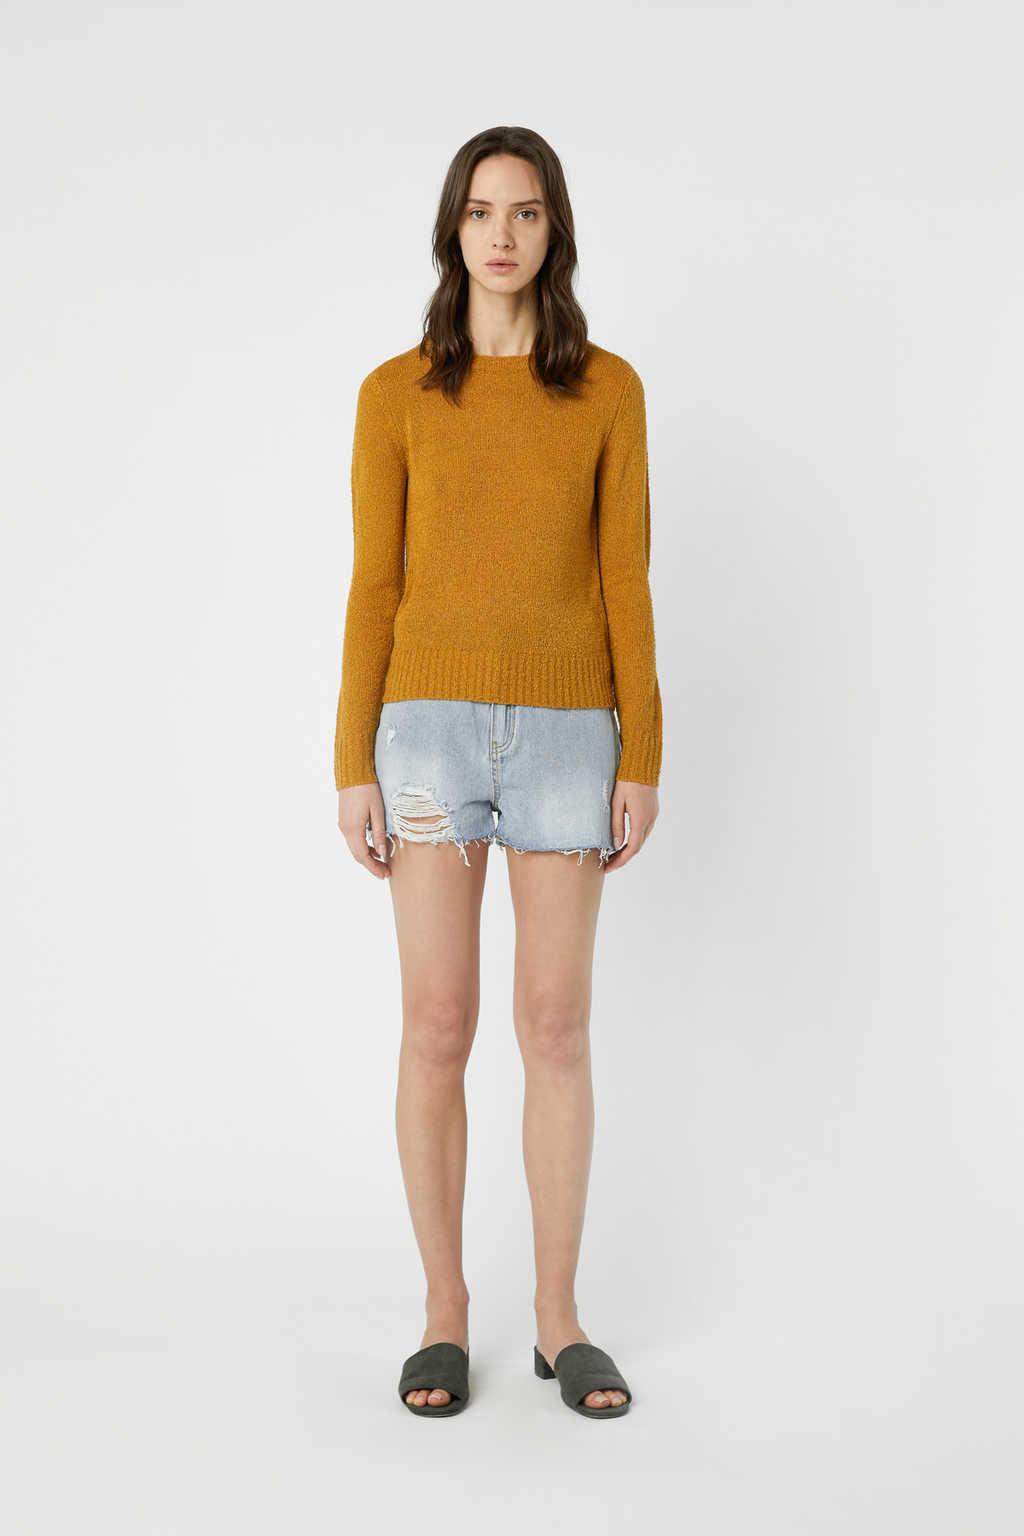 Sweater 3376 Mustard 2